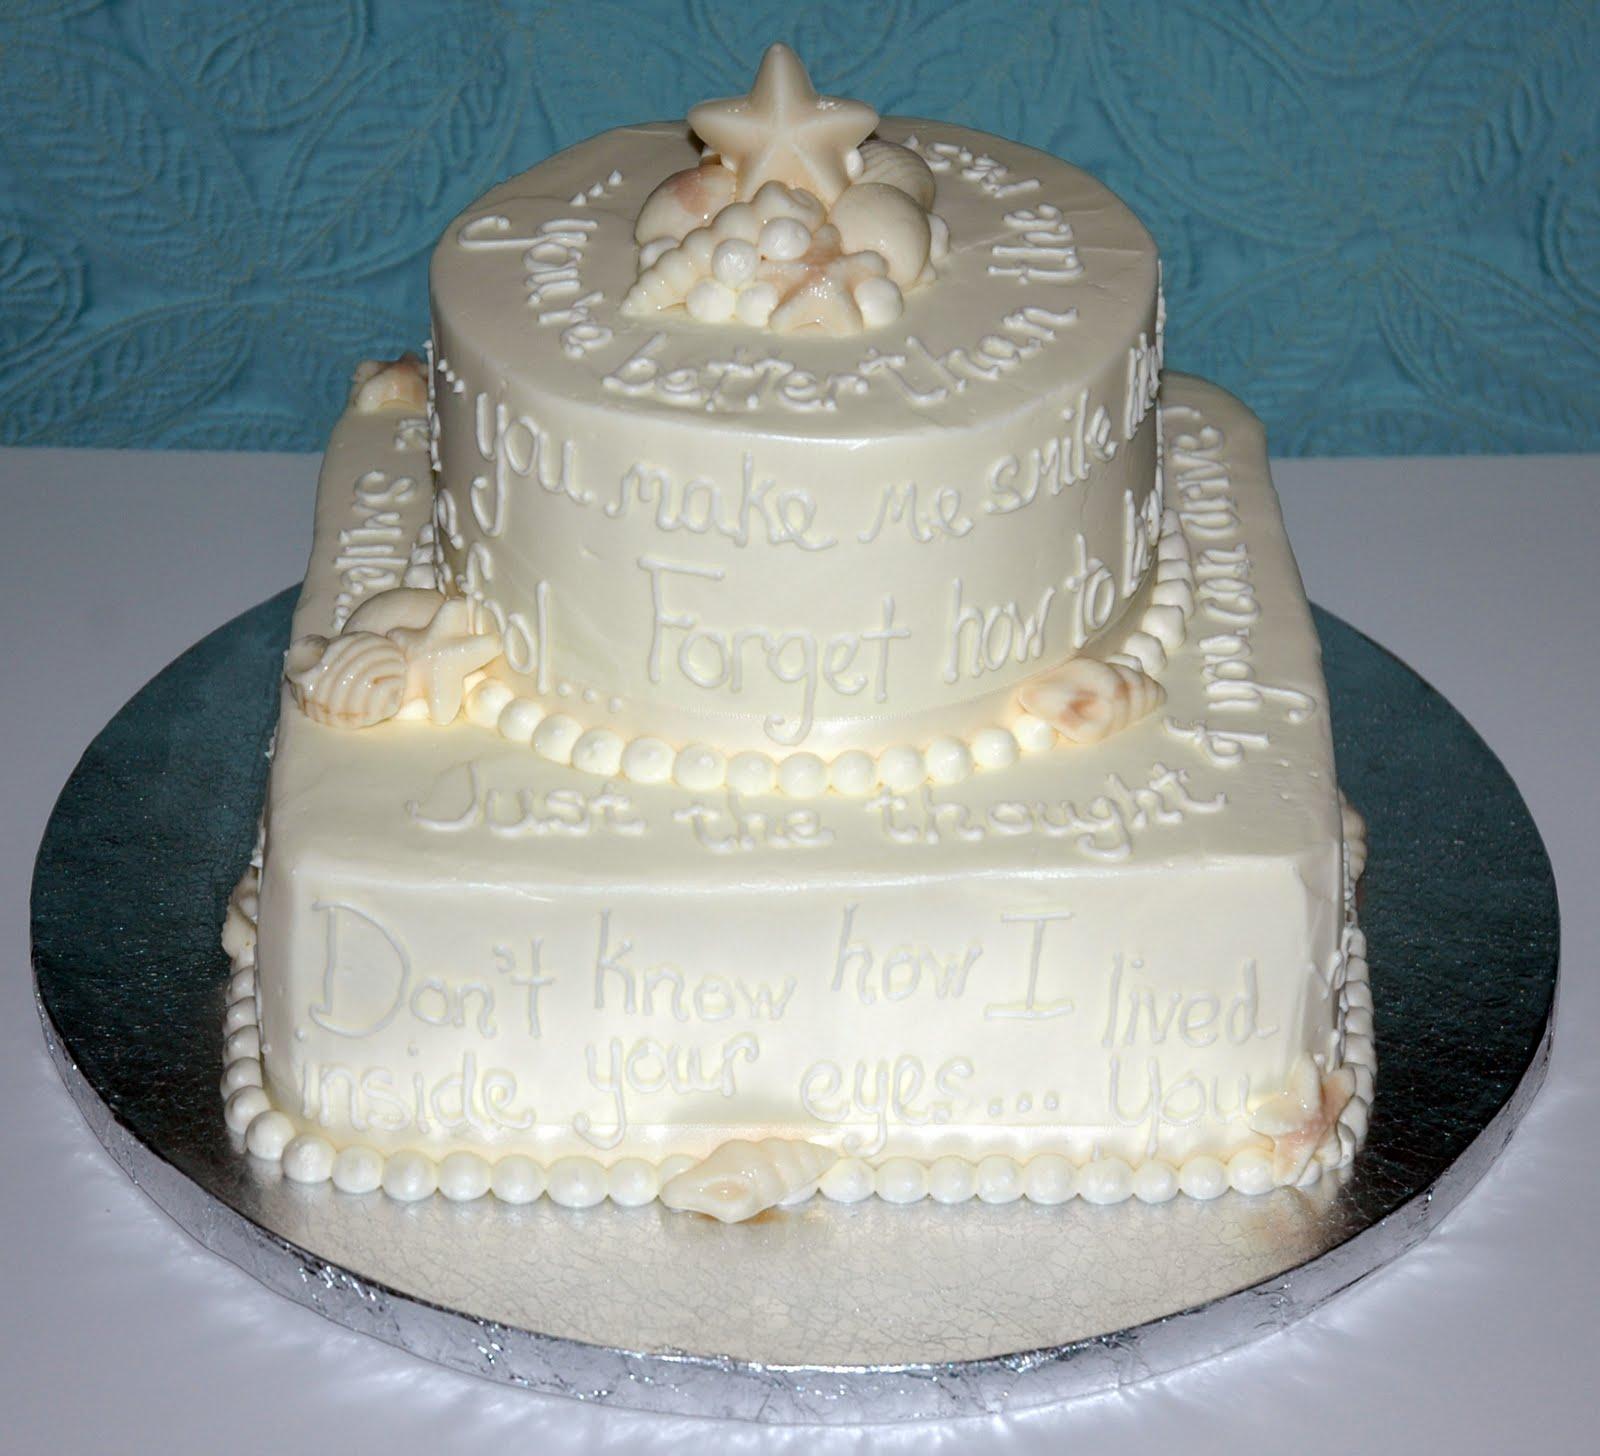 The Sugar Mamas Cakery Occasion Cakes